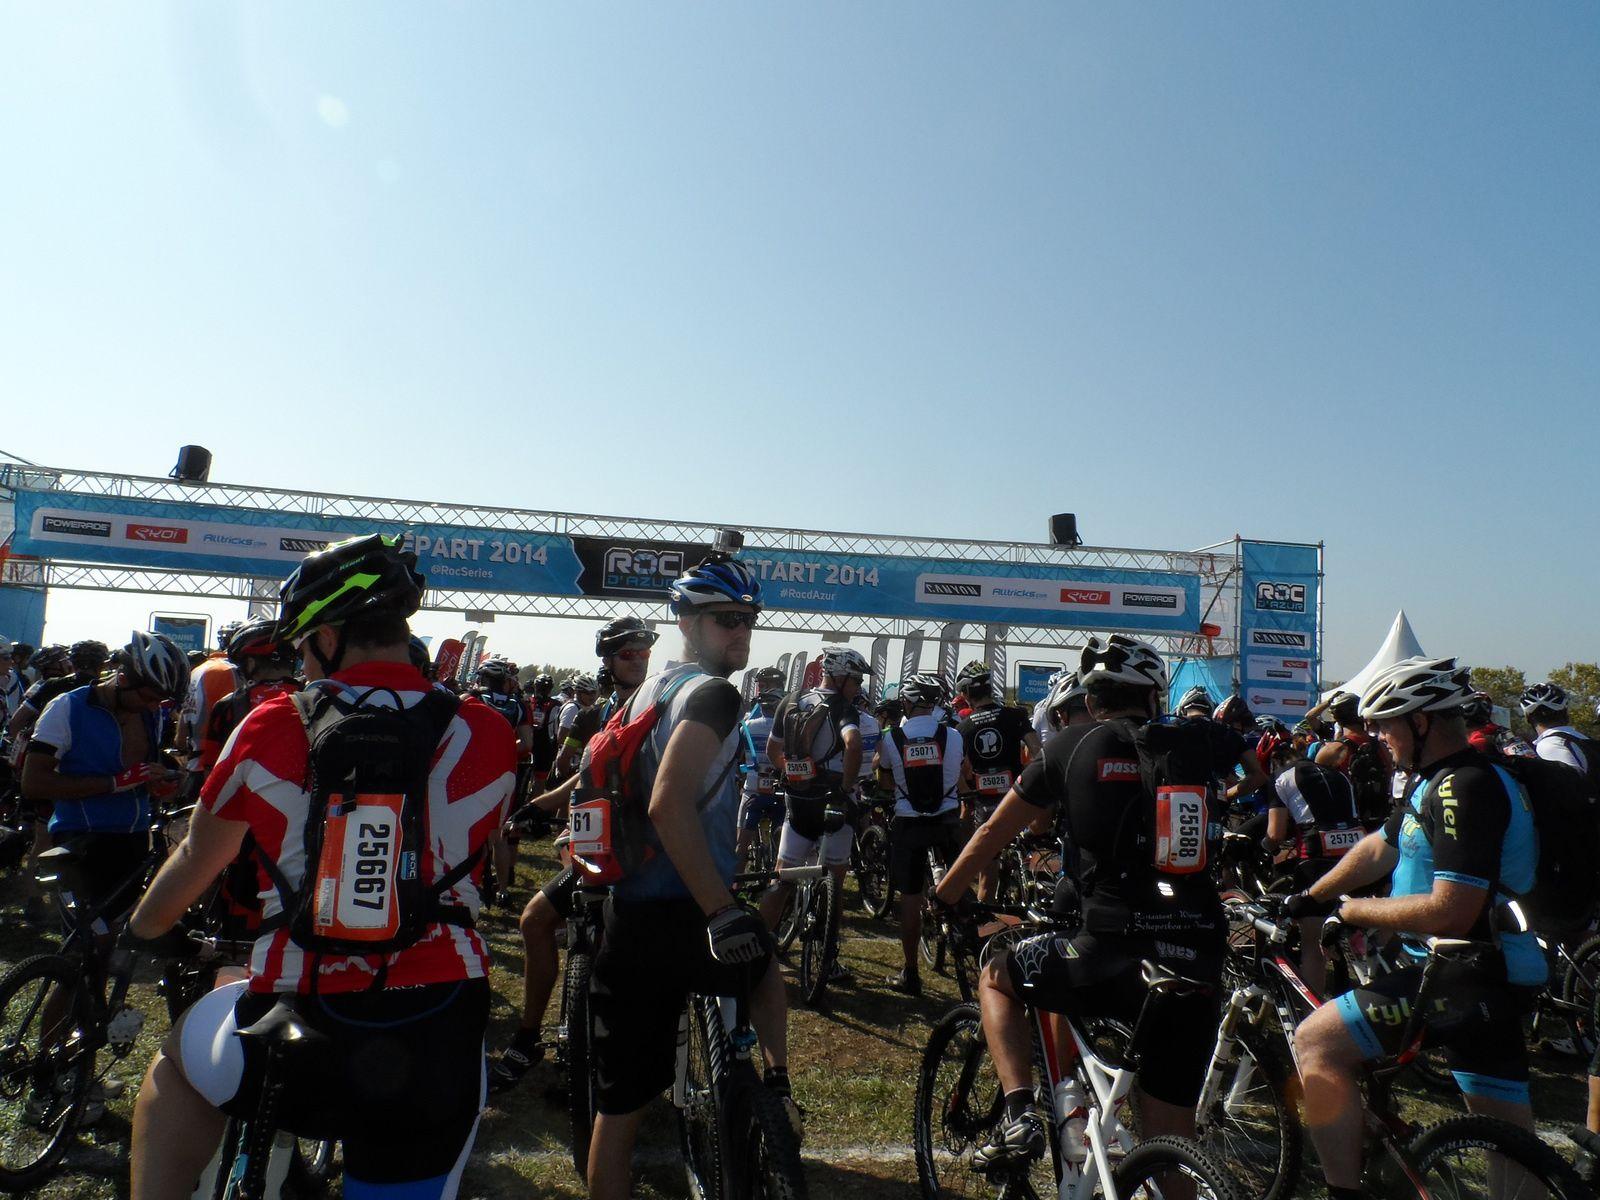 Le lendemain, rando Roc altitude, 44 km / 950 D+